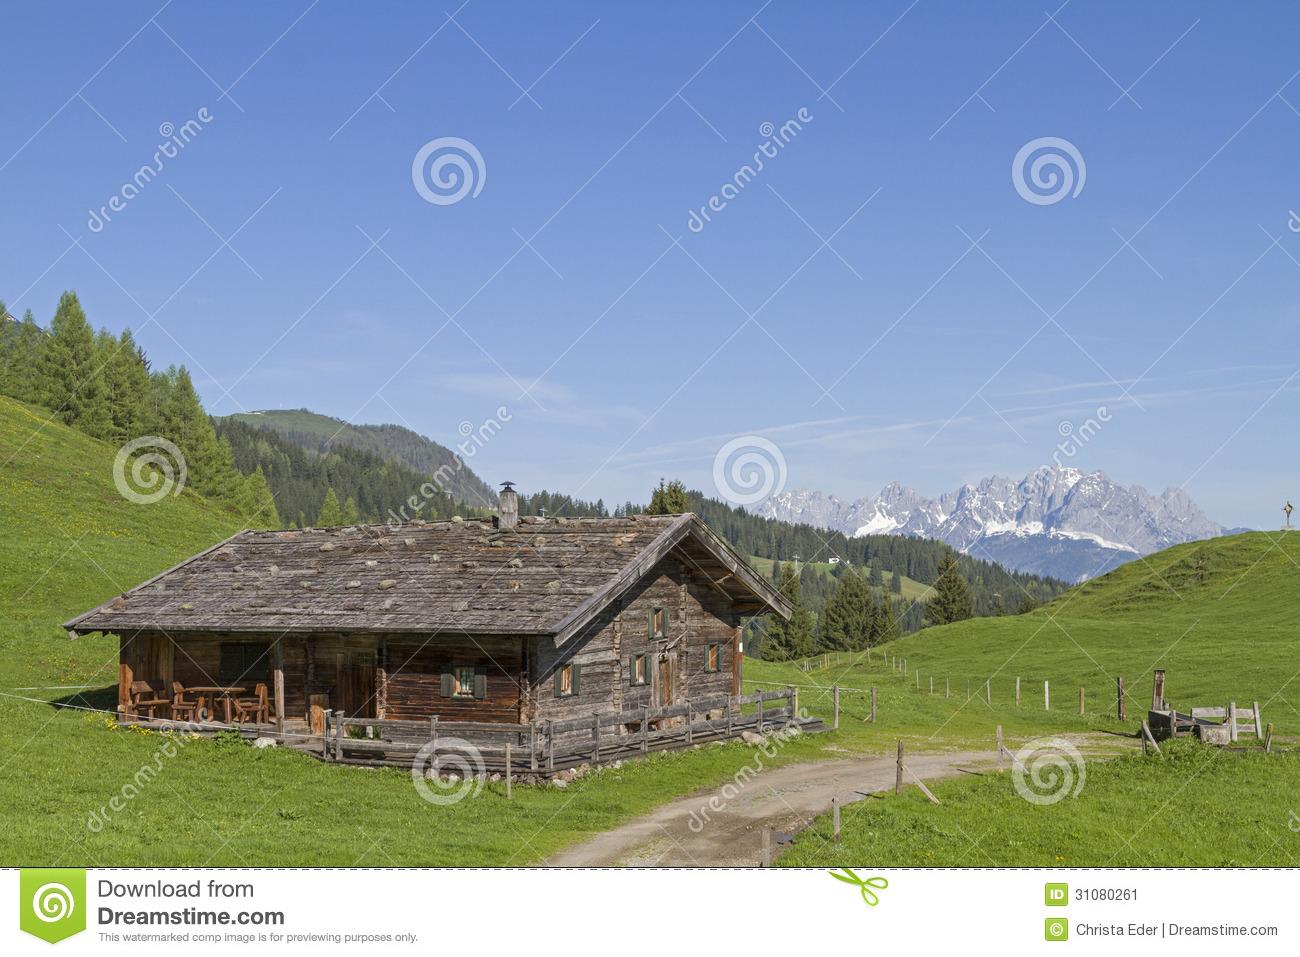 Almhütte Mit Kaisergebirge Stock Image.